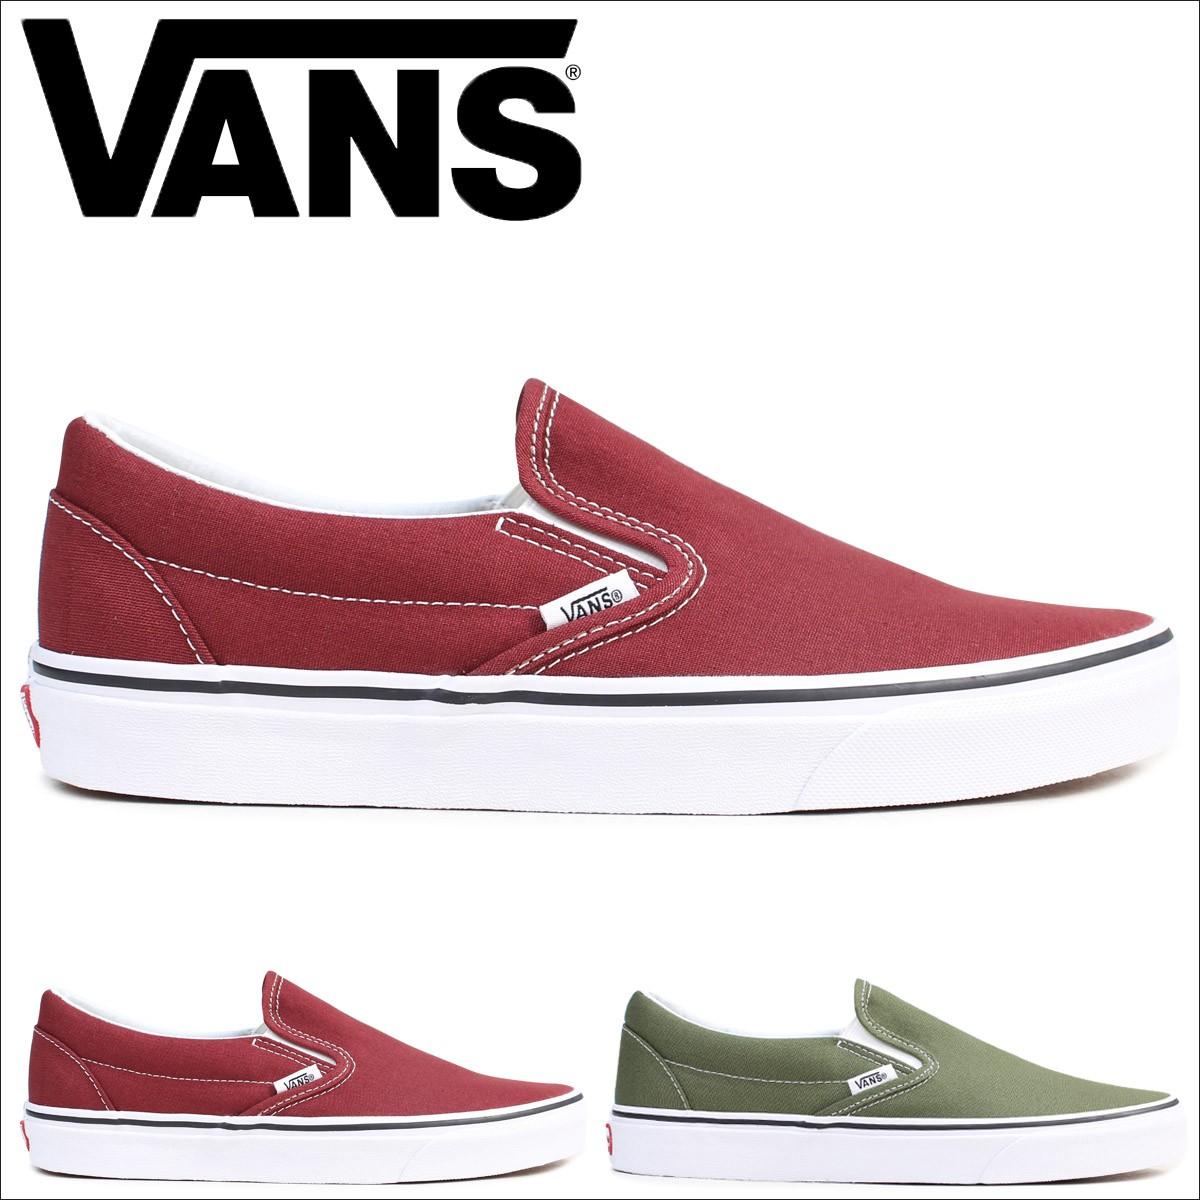 VANS スリッポン メンズ スニーカー バンズ ヴァンズ CLASSIC SLIP-ON VN0A38F7OVK VN0A38F7OW2 靴 ブラウン グリーン [12/19 追加入荷]